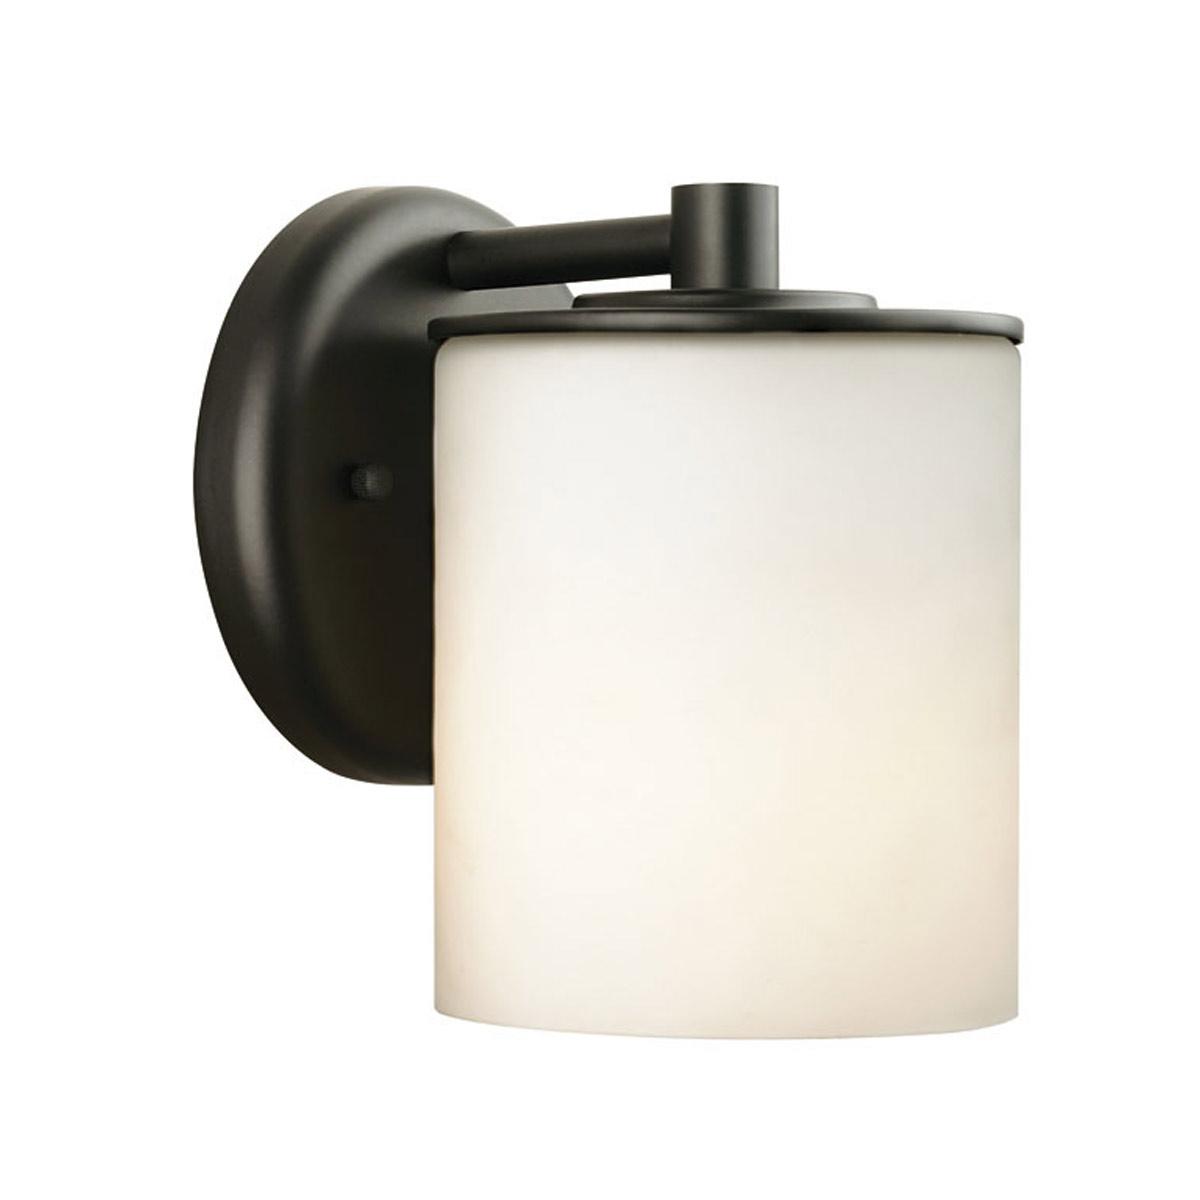 exterior lighting fixtures wall mount viewing gallery. Black Bedroom Furniture Sets. Home Design Ideas